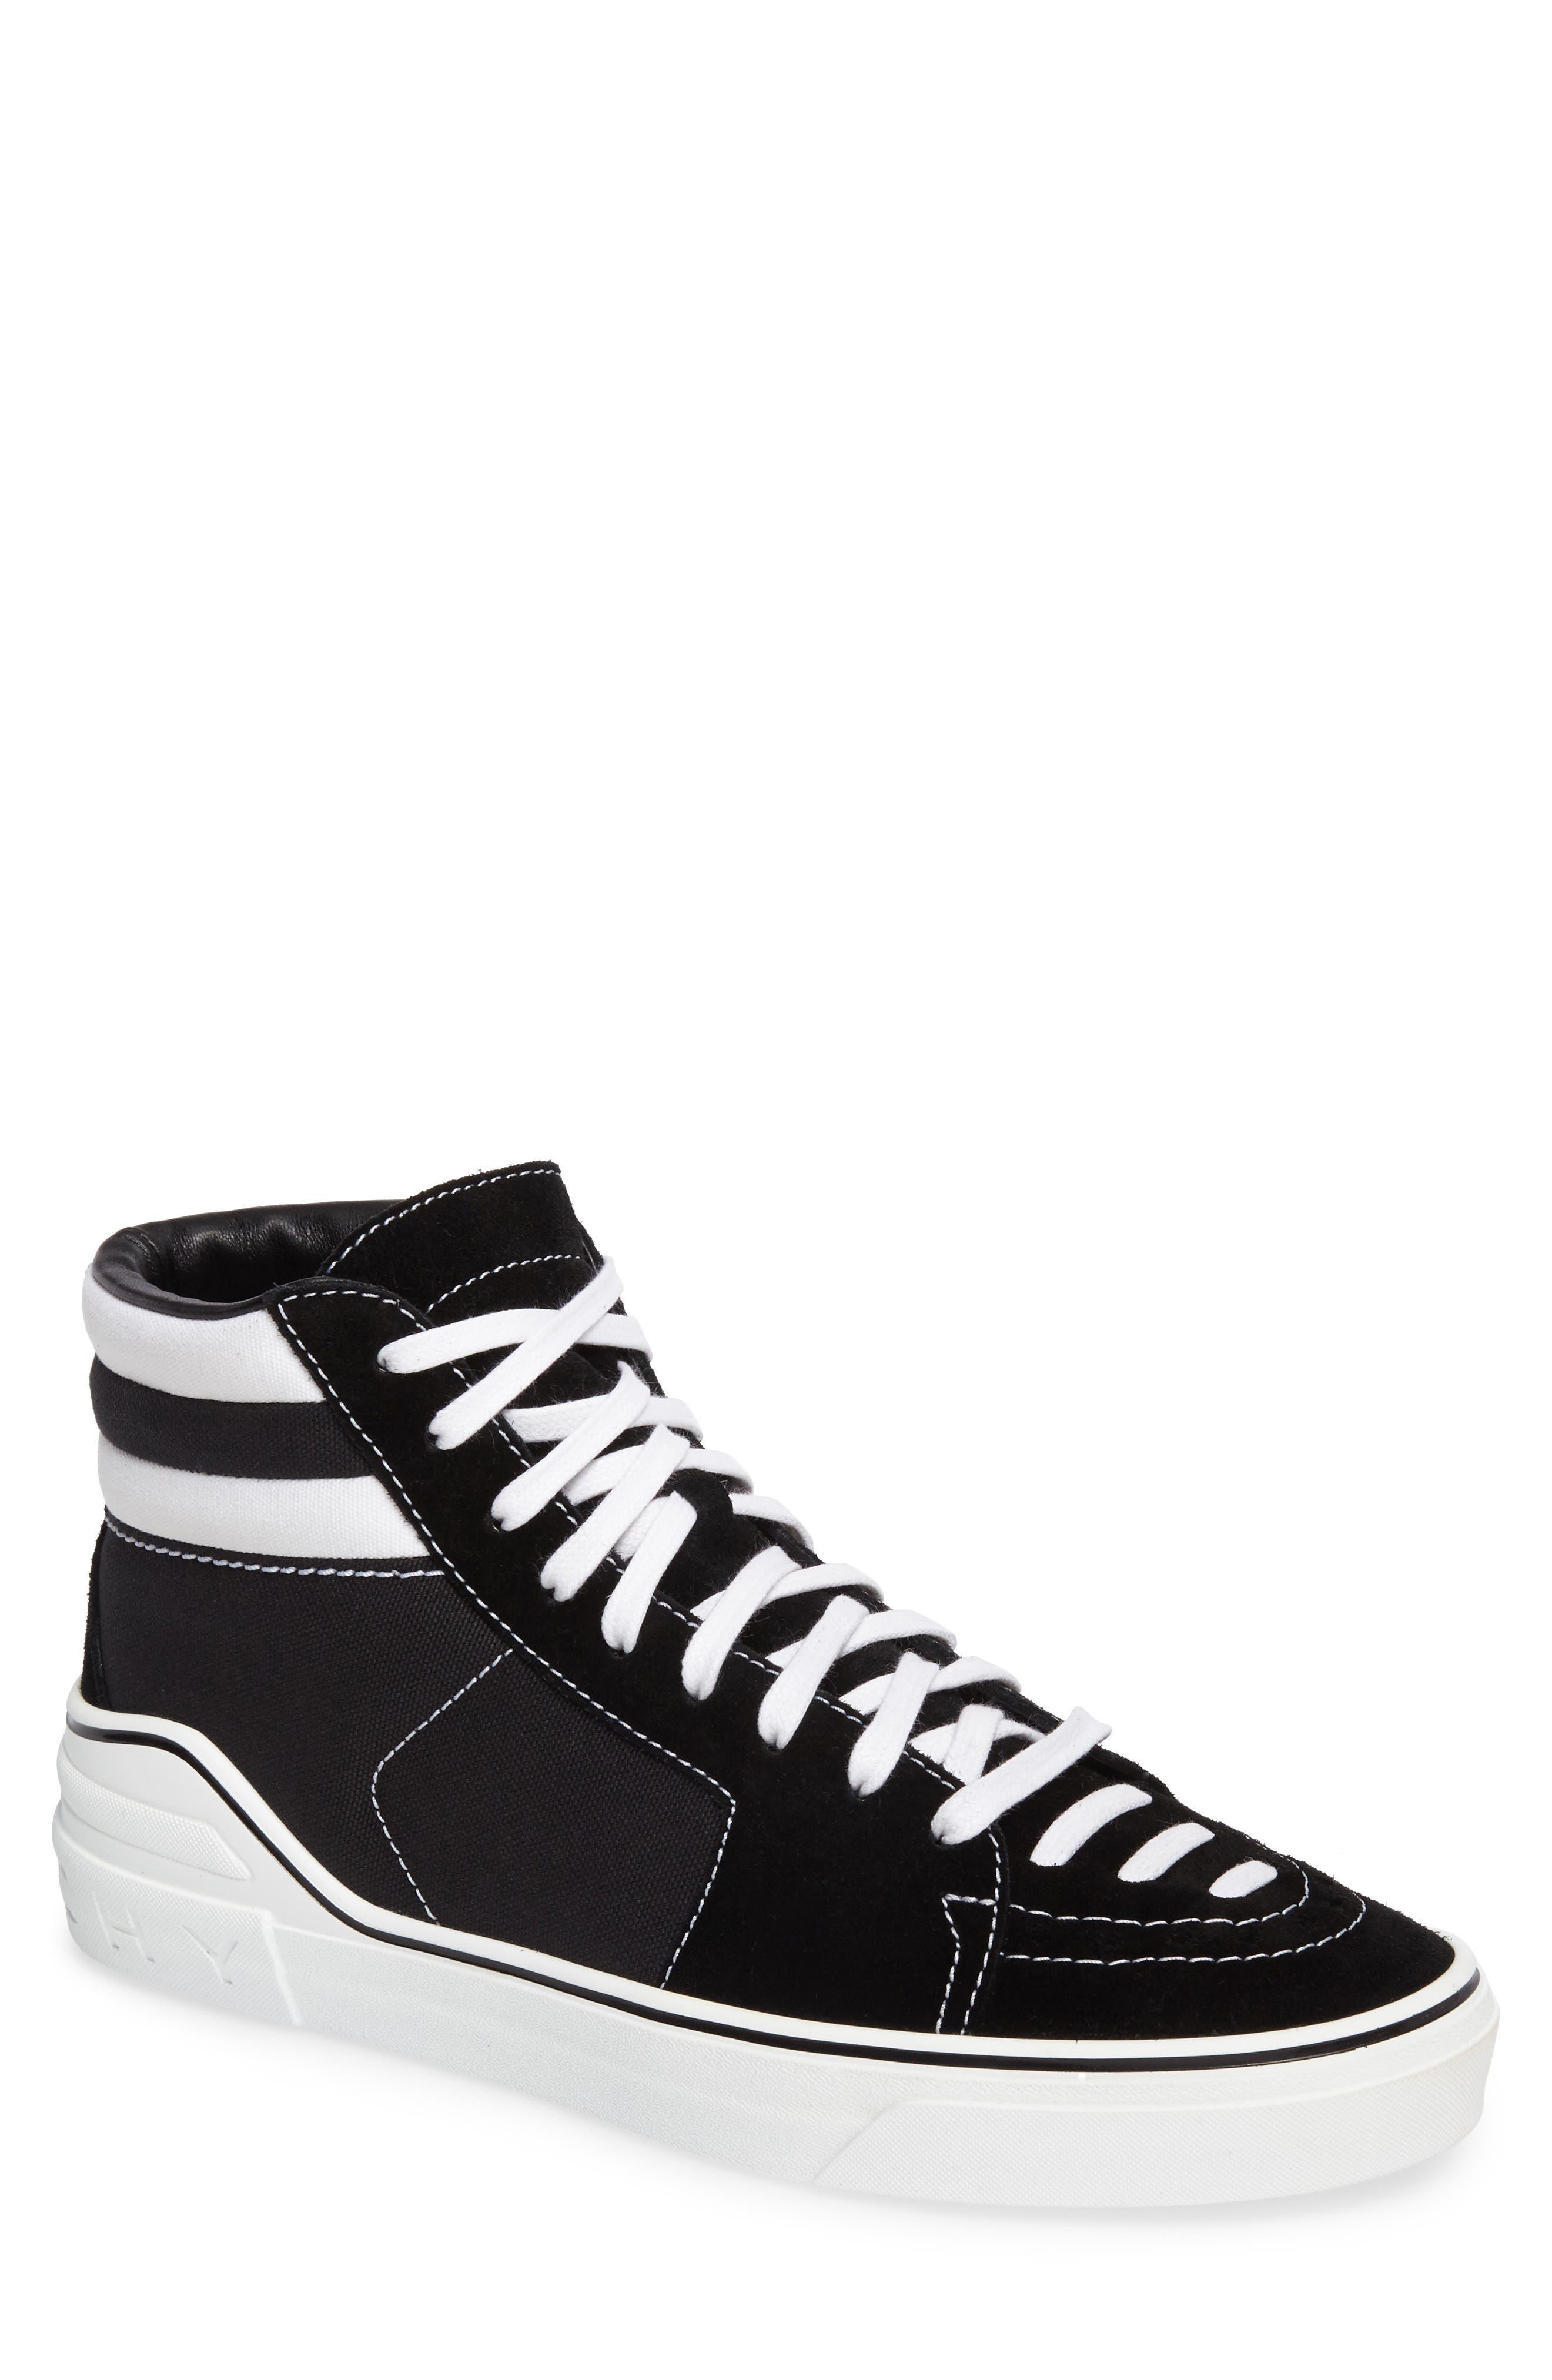 High Top Sneaker,                             Main thumbnail 1, color,                             004